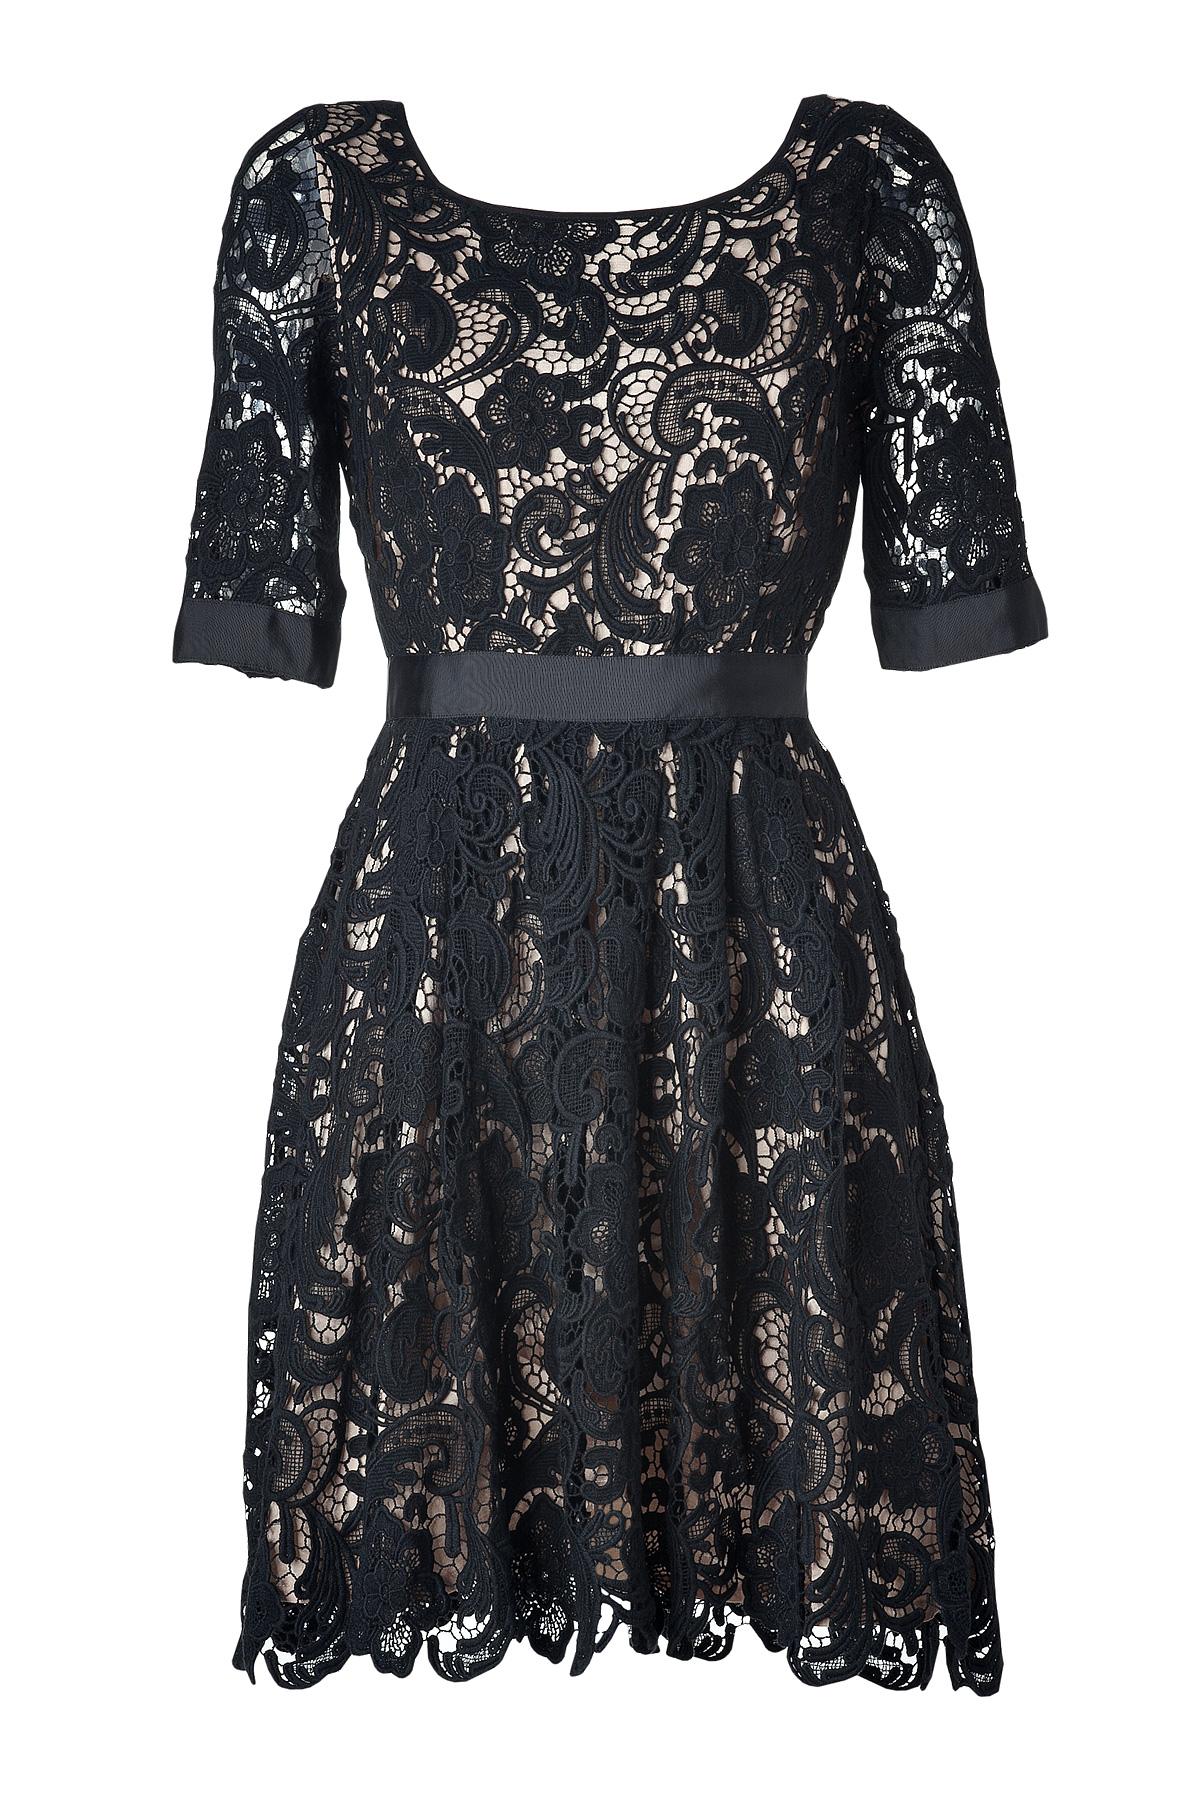 Stylebop Collette Dinnagan Lace Dress